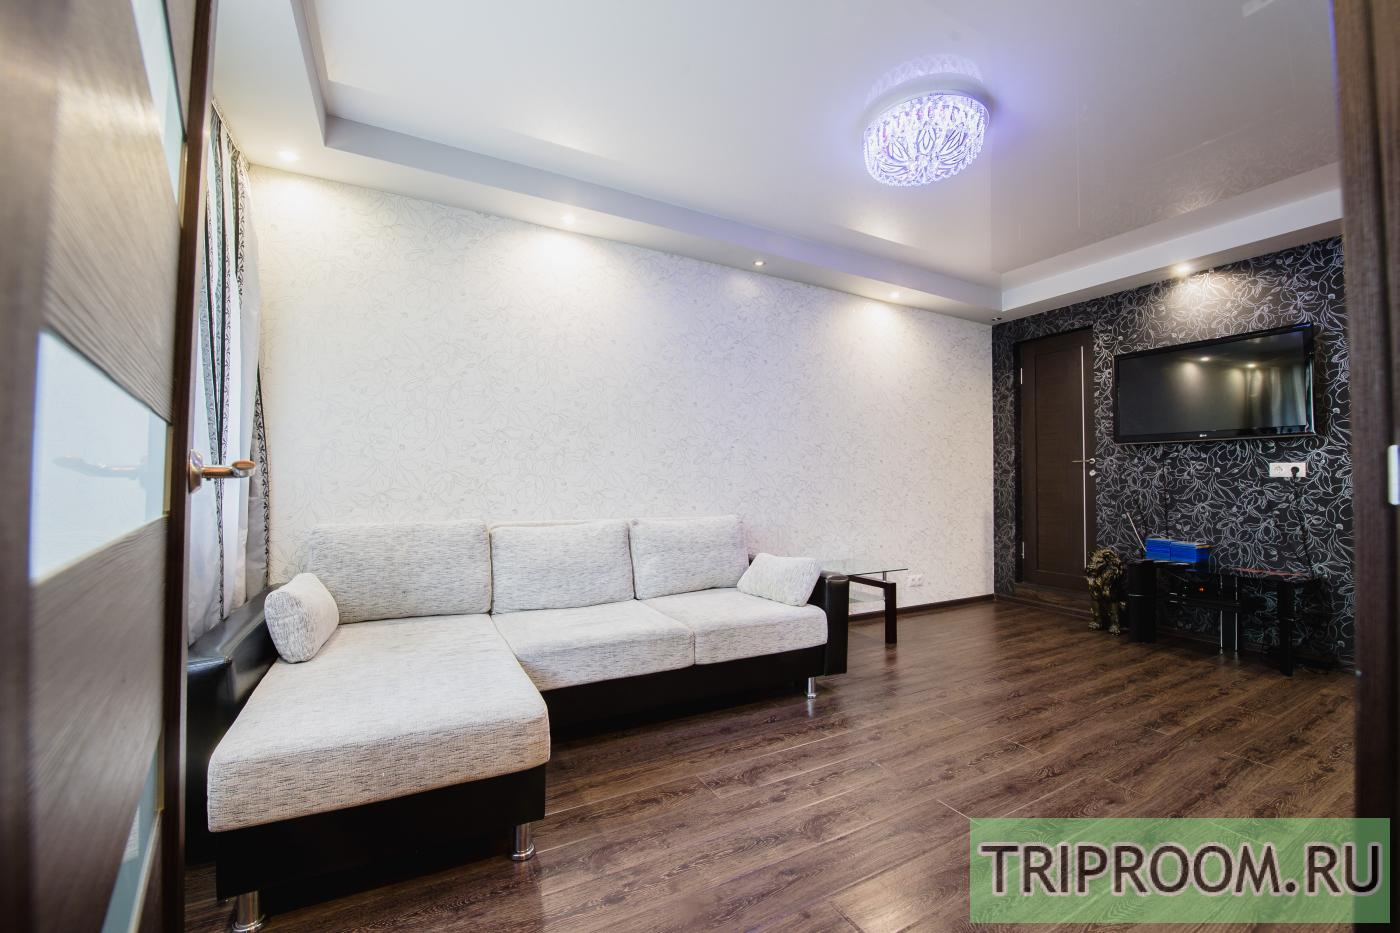 1-комнатная квартира посуточно (вариант № 14780), ул. Шевченко улица, фото № 7